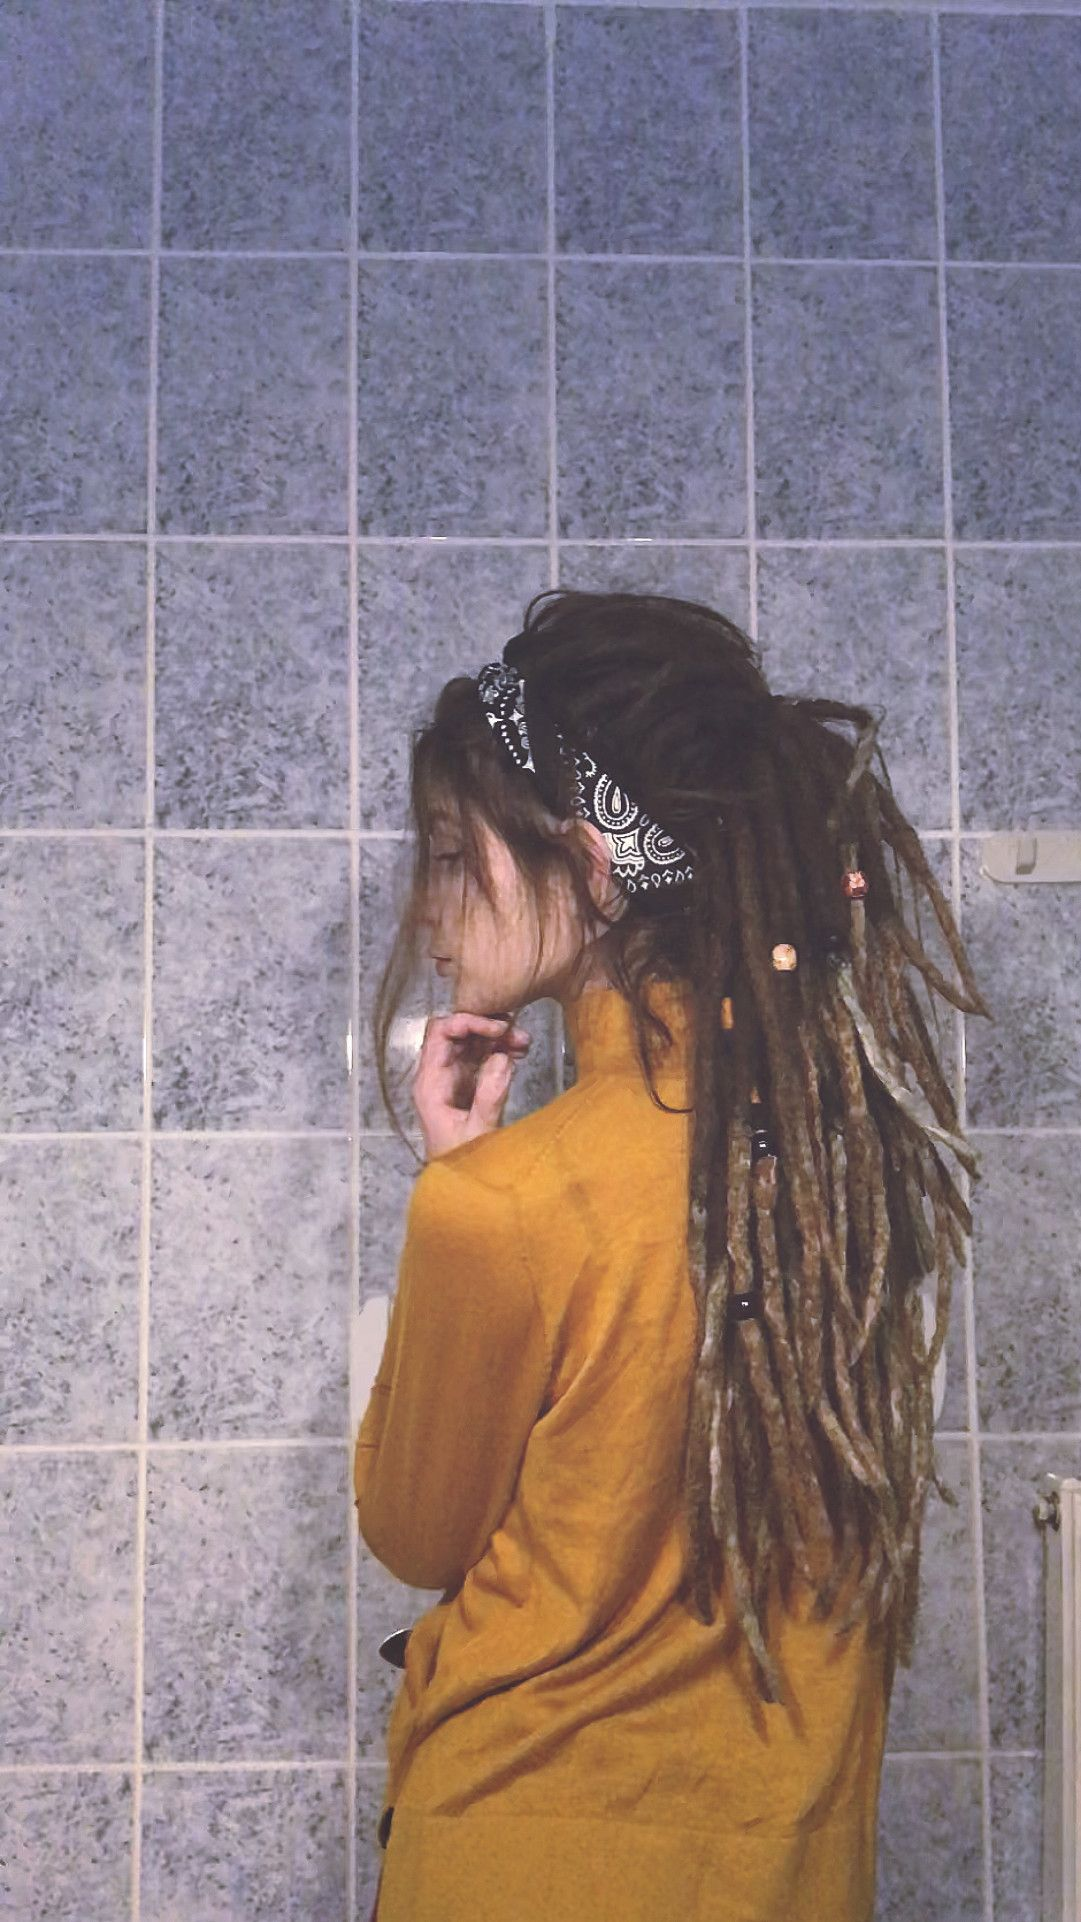 rasta, hippy, dreads, dreadlocks   hair ideas in 2019